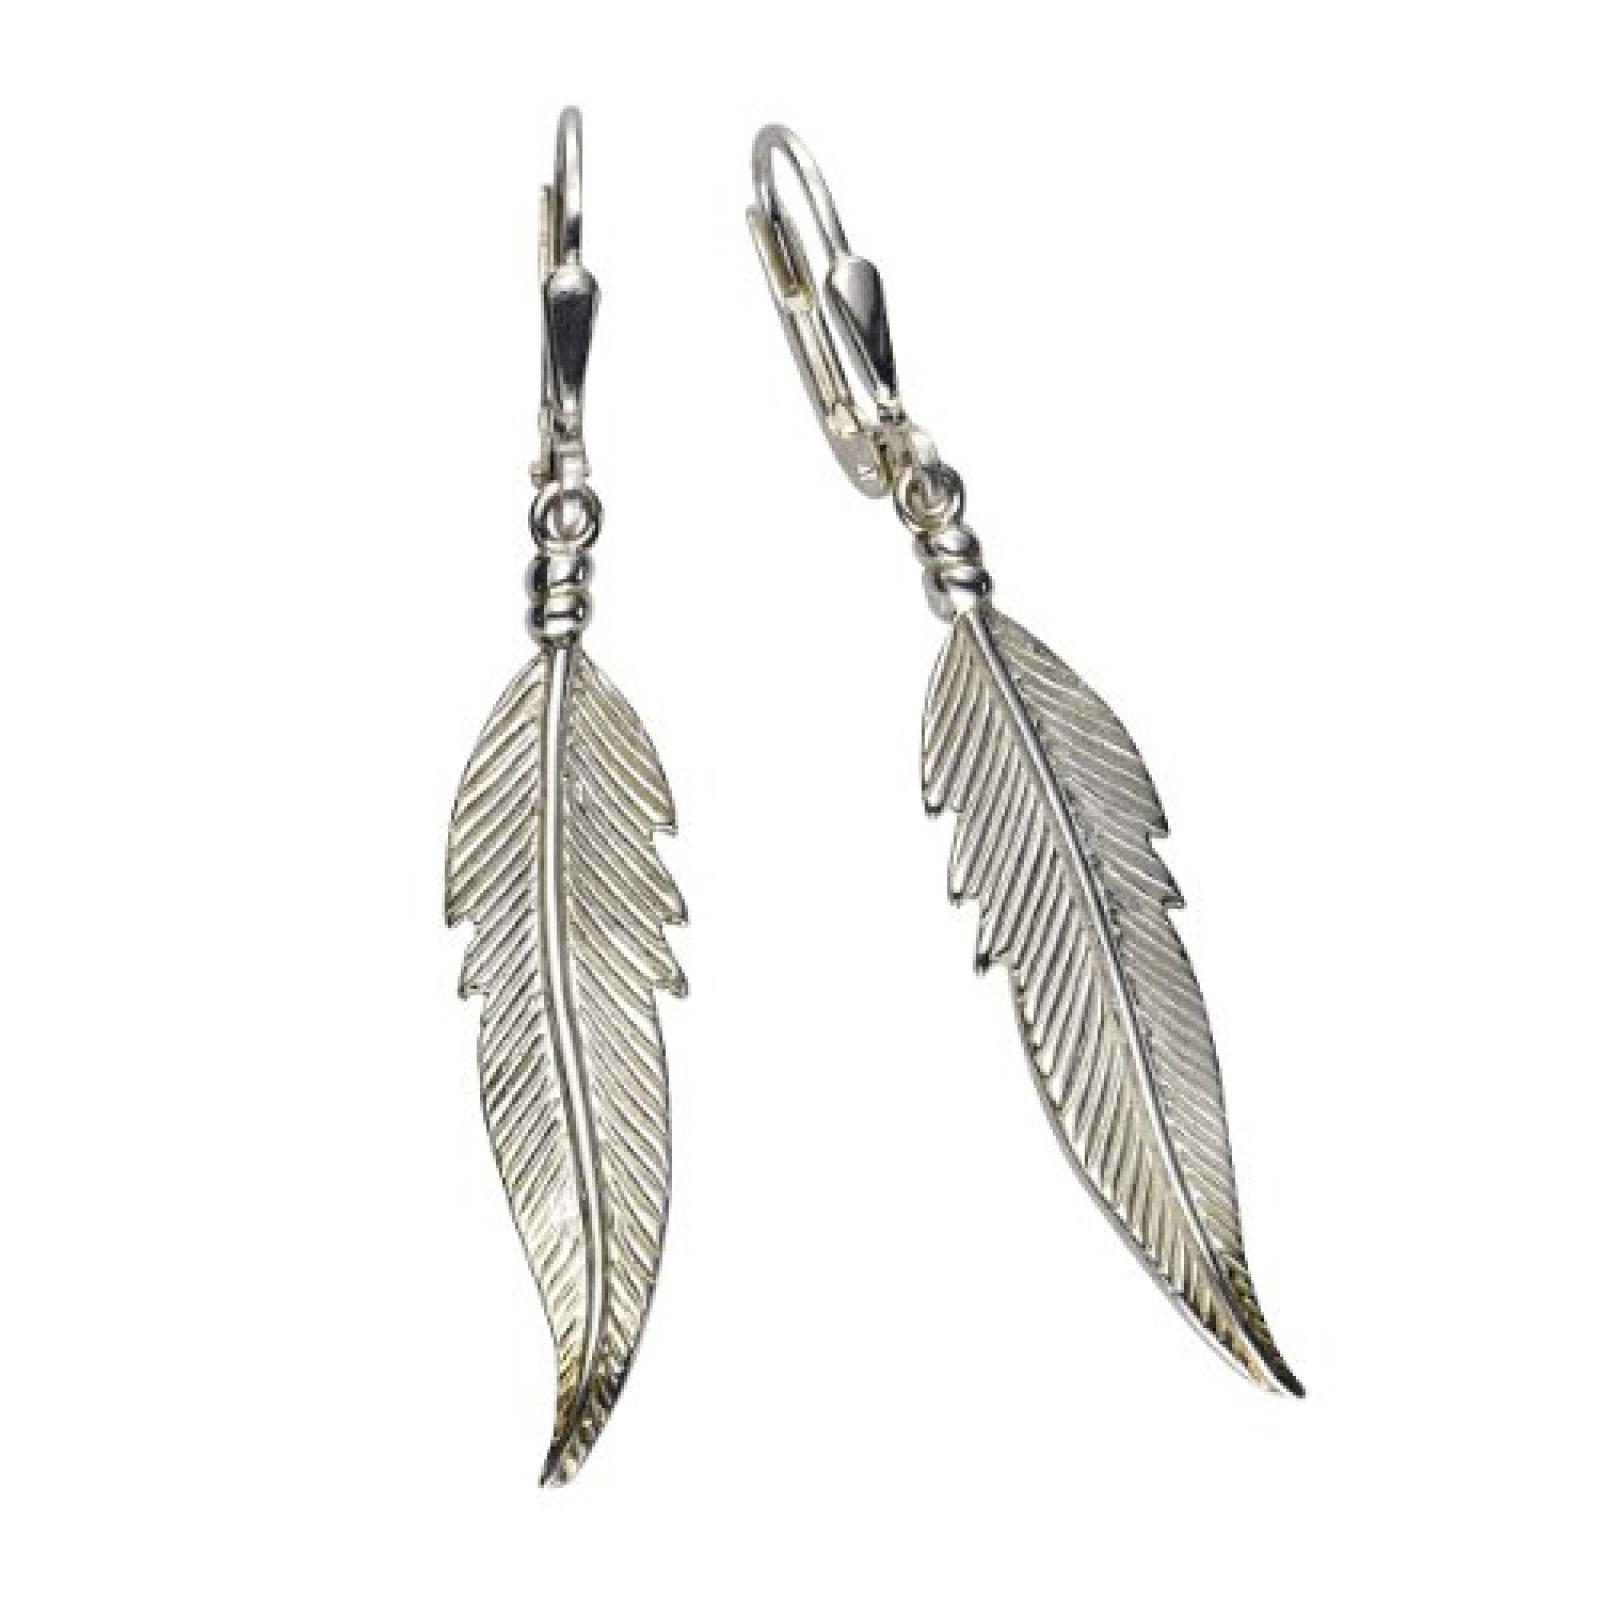 ZEEme Damen-Ohrhänger 925 Sterling Silber Feder 48mm lang 371230159